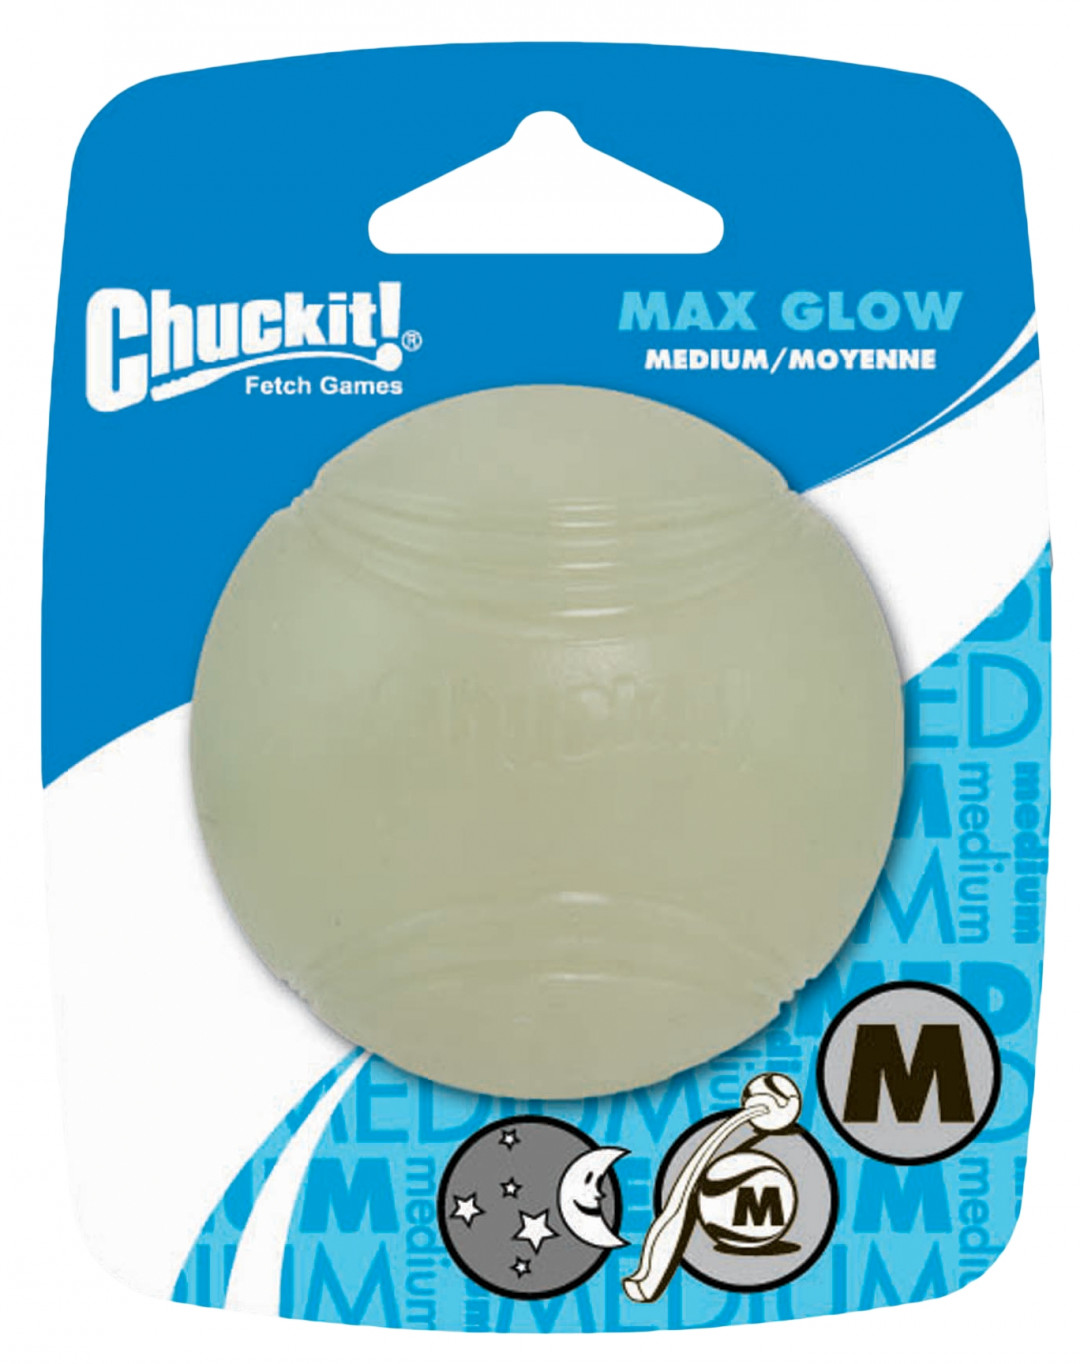 Chuckit! Max Glow